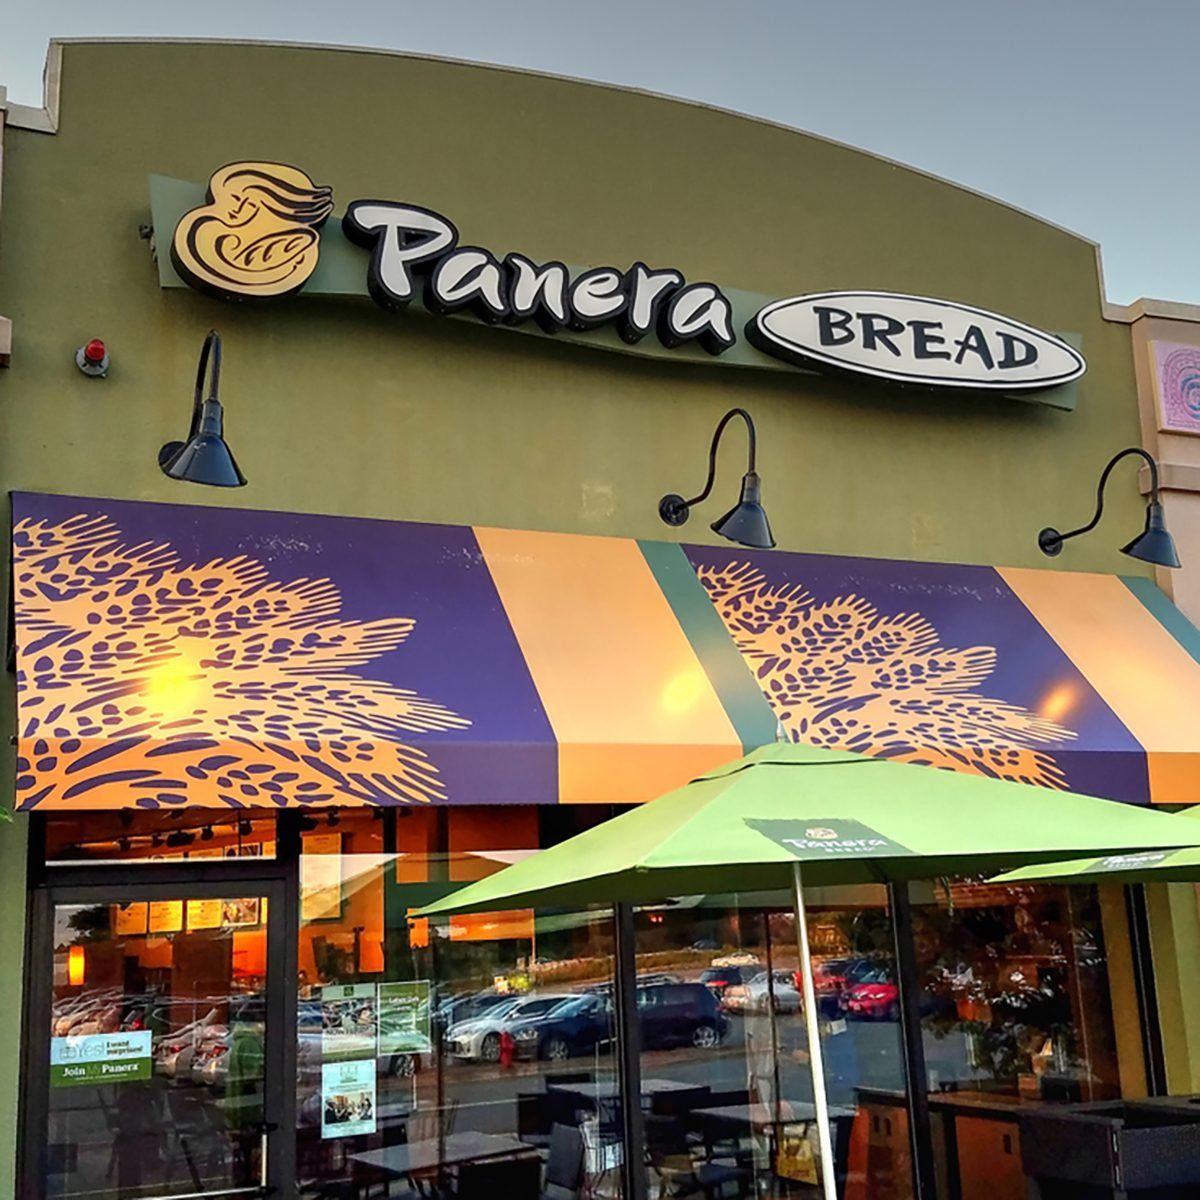 HDR image, Panera Bread sandwich restaurant, patio entrance